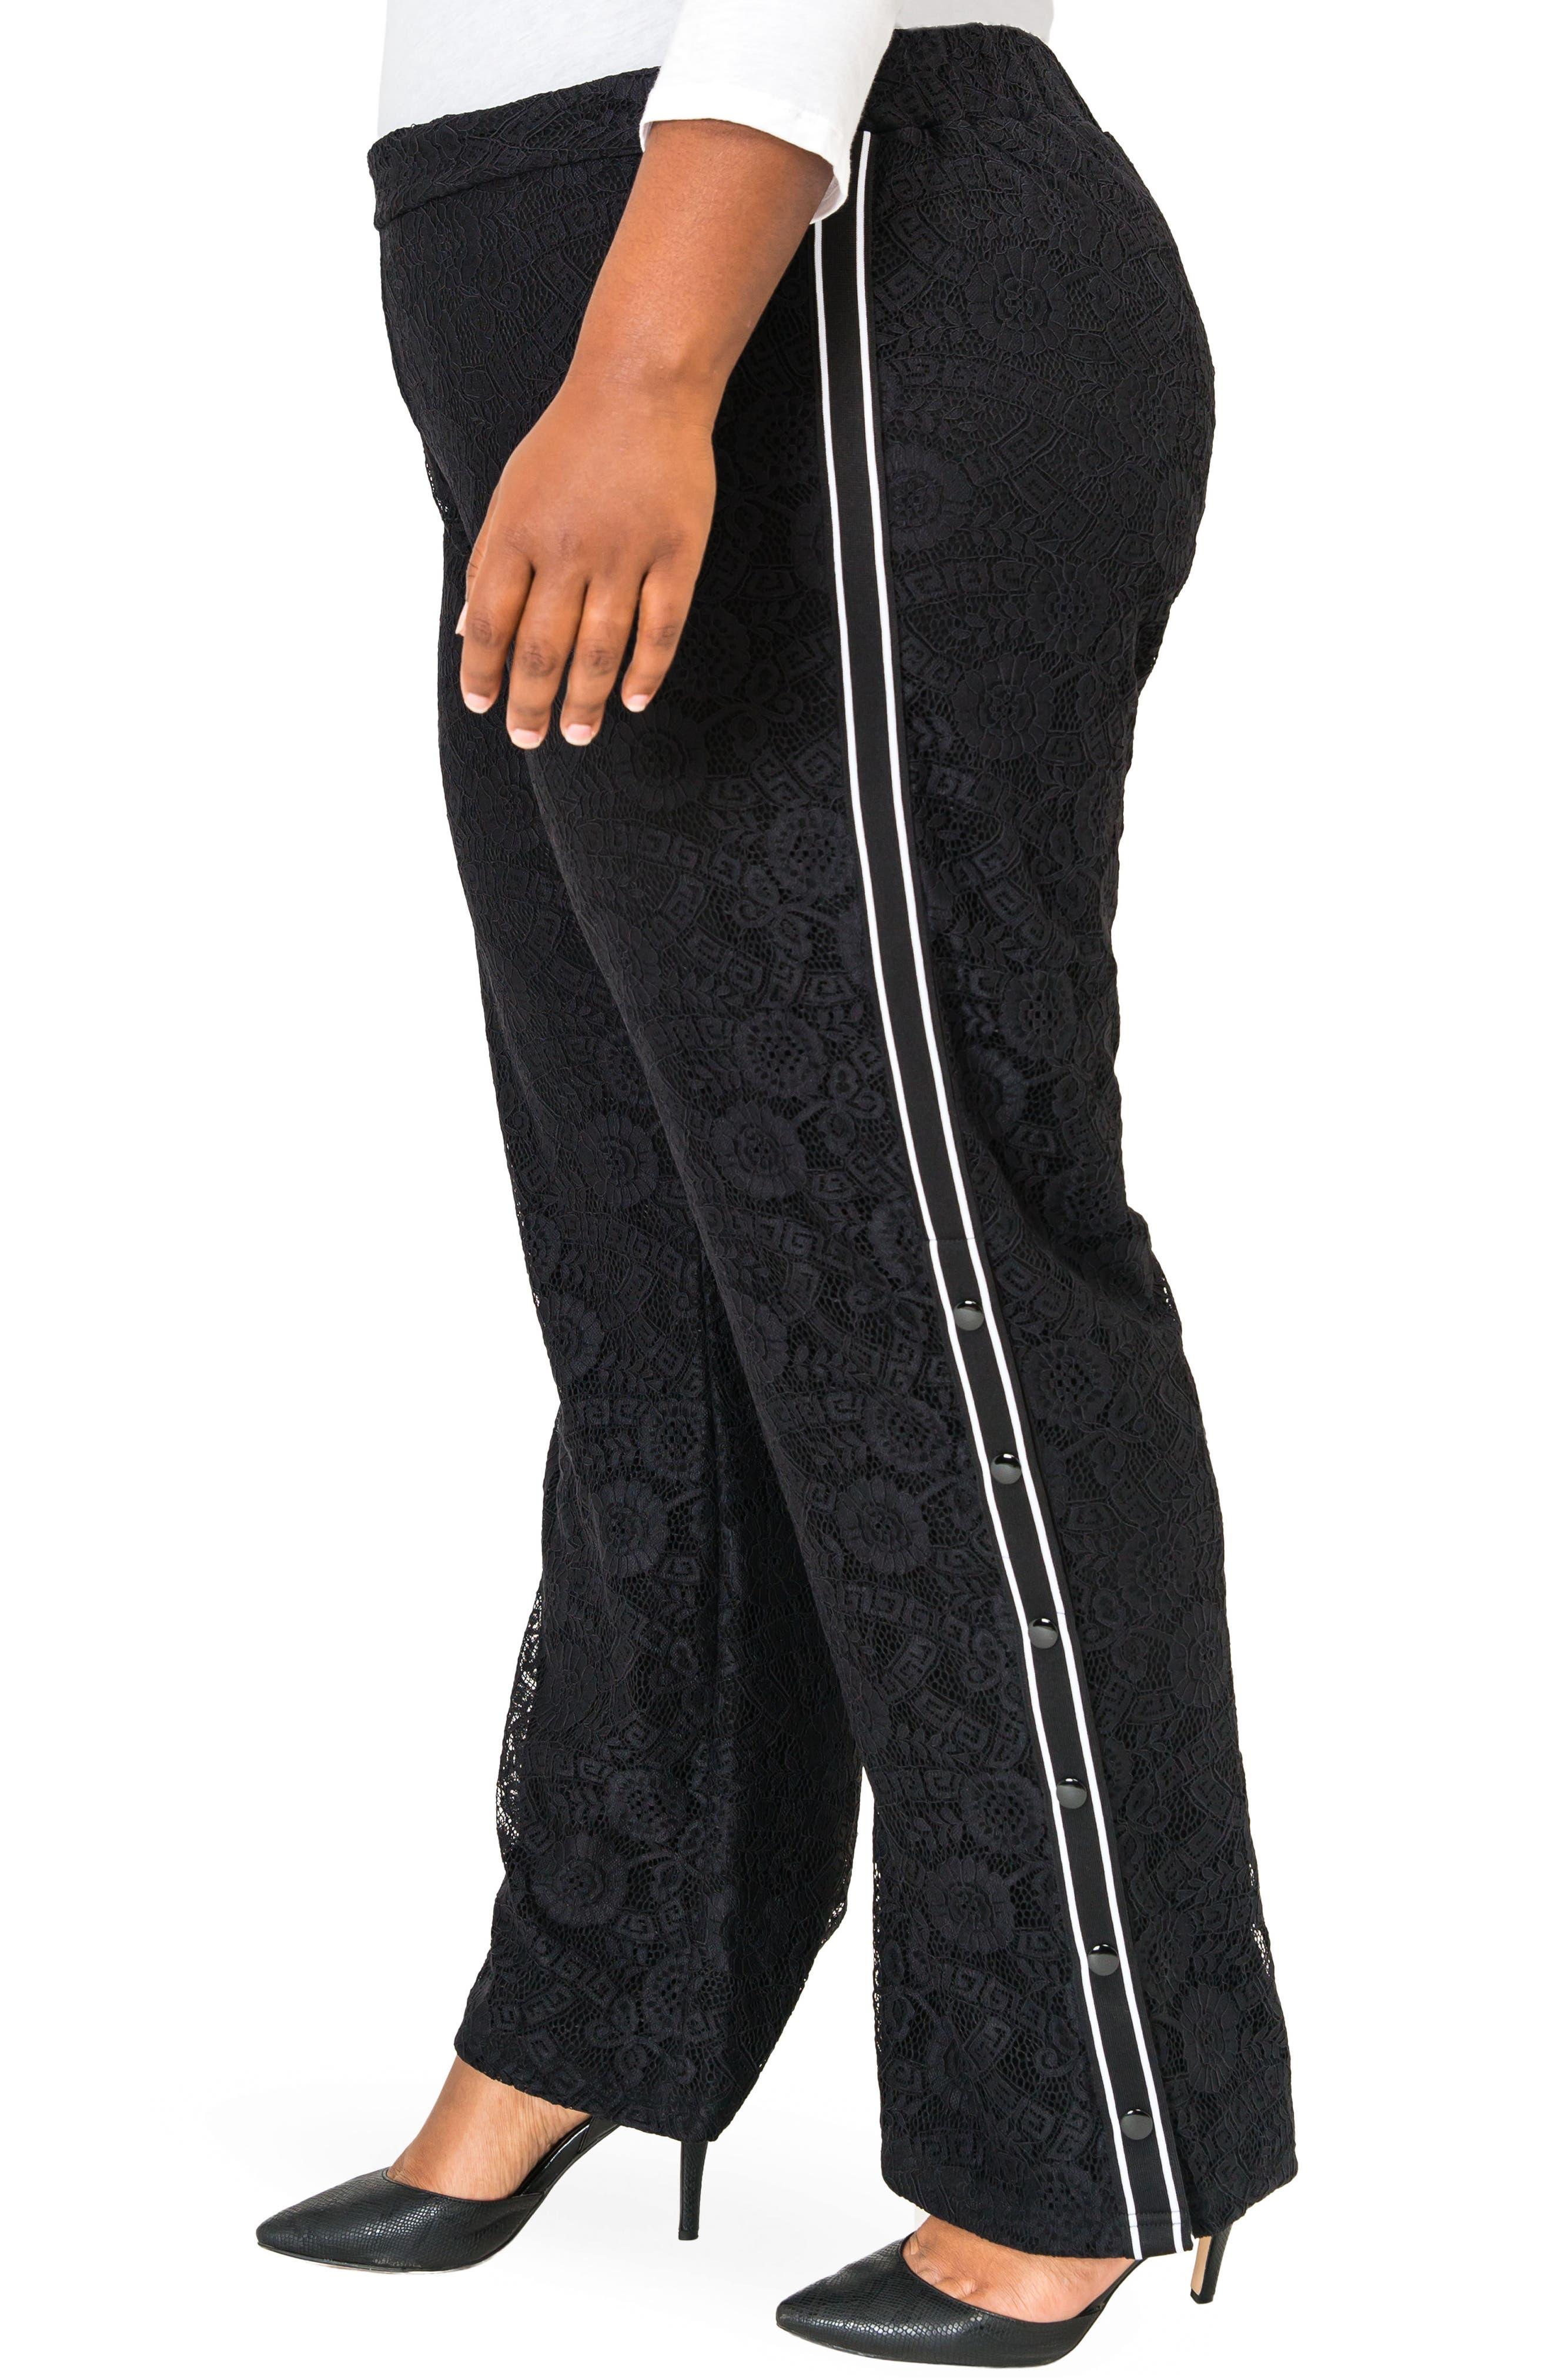 POETIC JUSTICE, Cornella High Rise Lace Knit Track Pants, Alternate thumbnail 3, color, BLACK